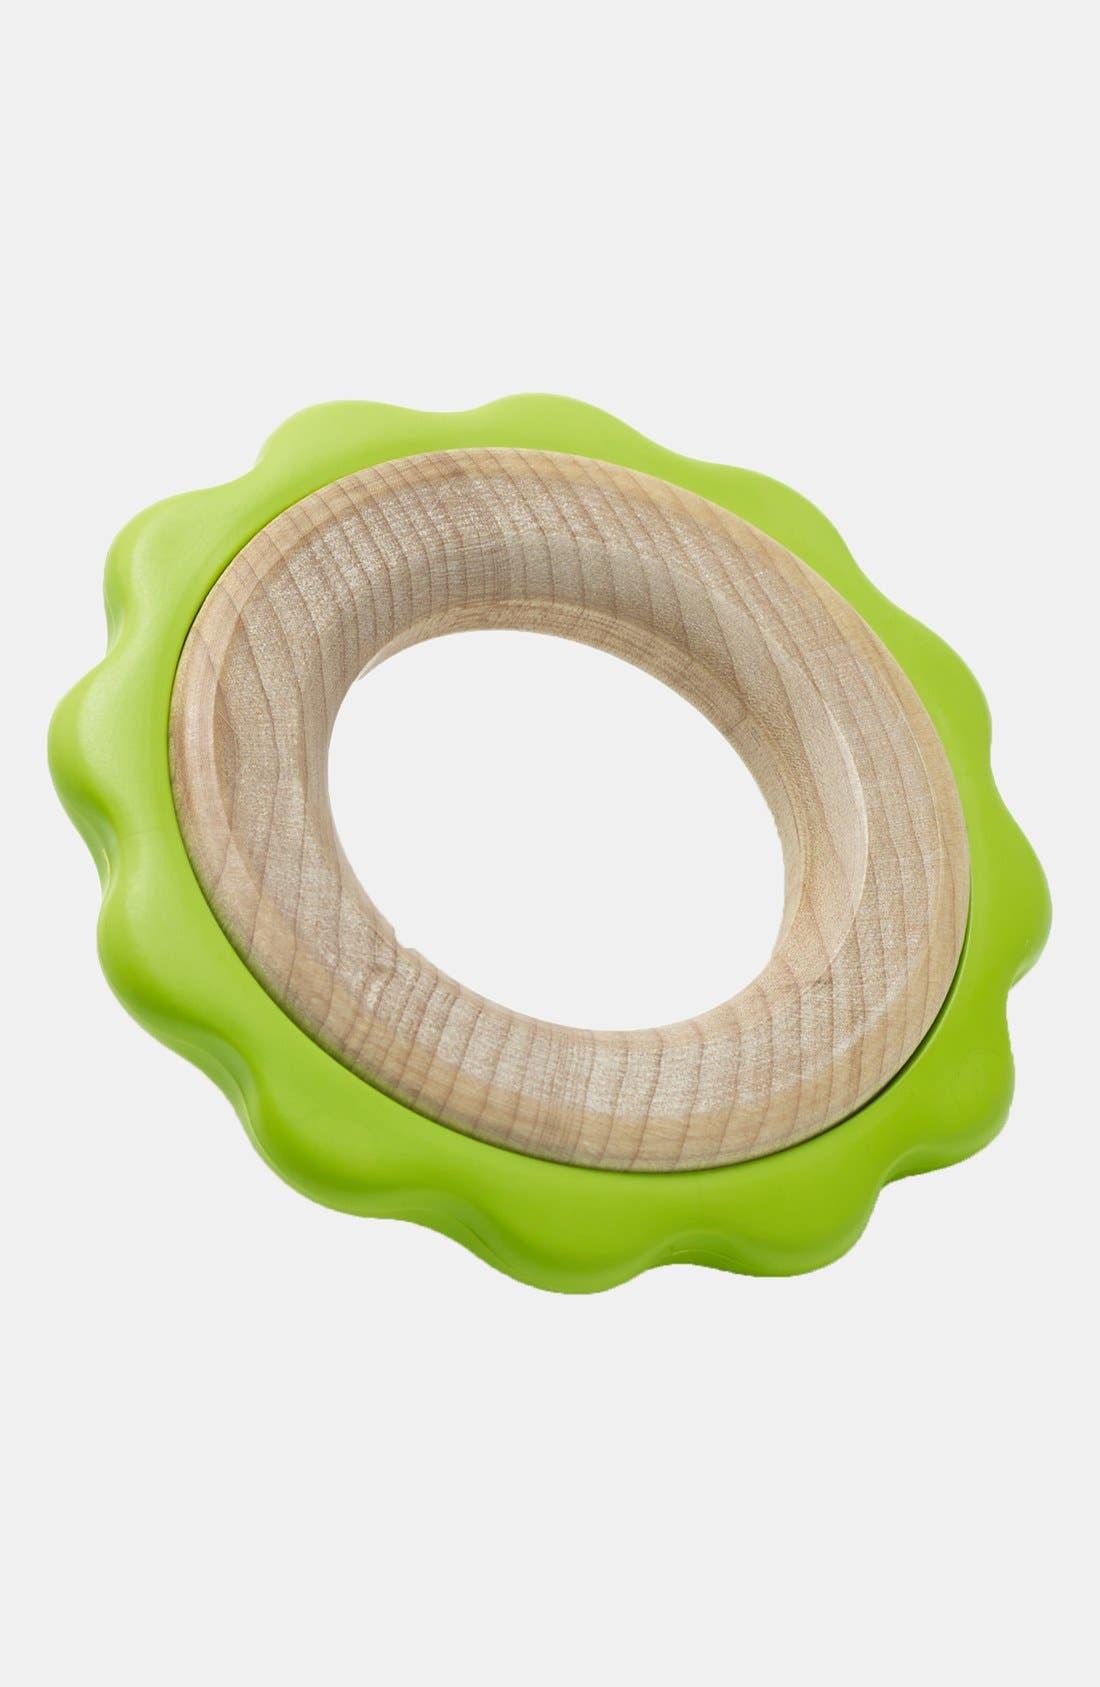 Alternate Image 1 Selected - BeginAgain Toys Green Ring